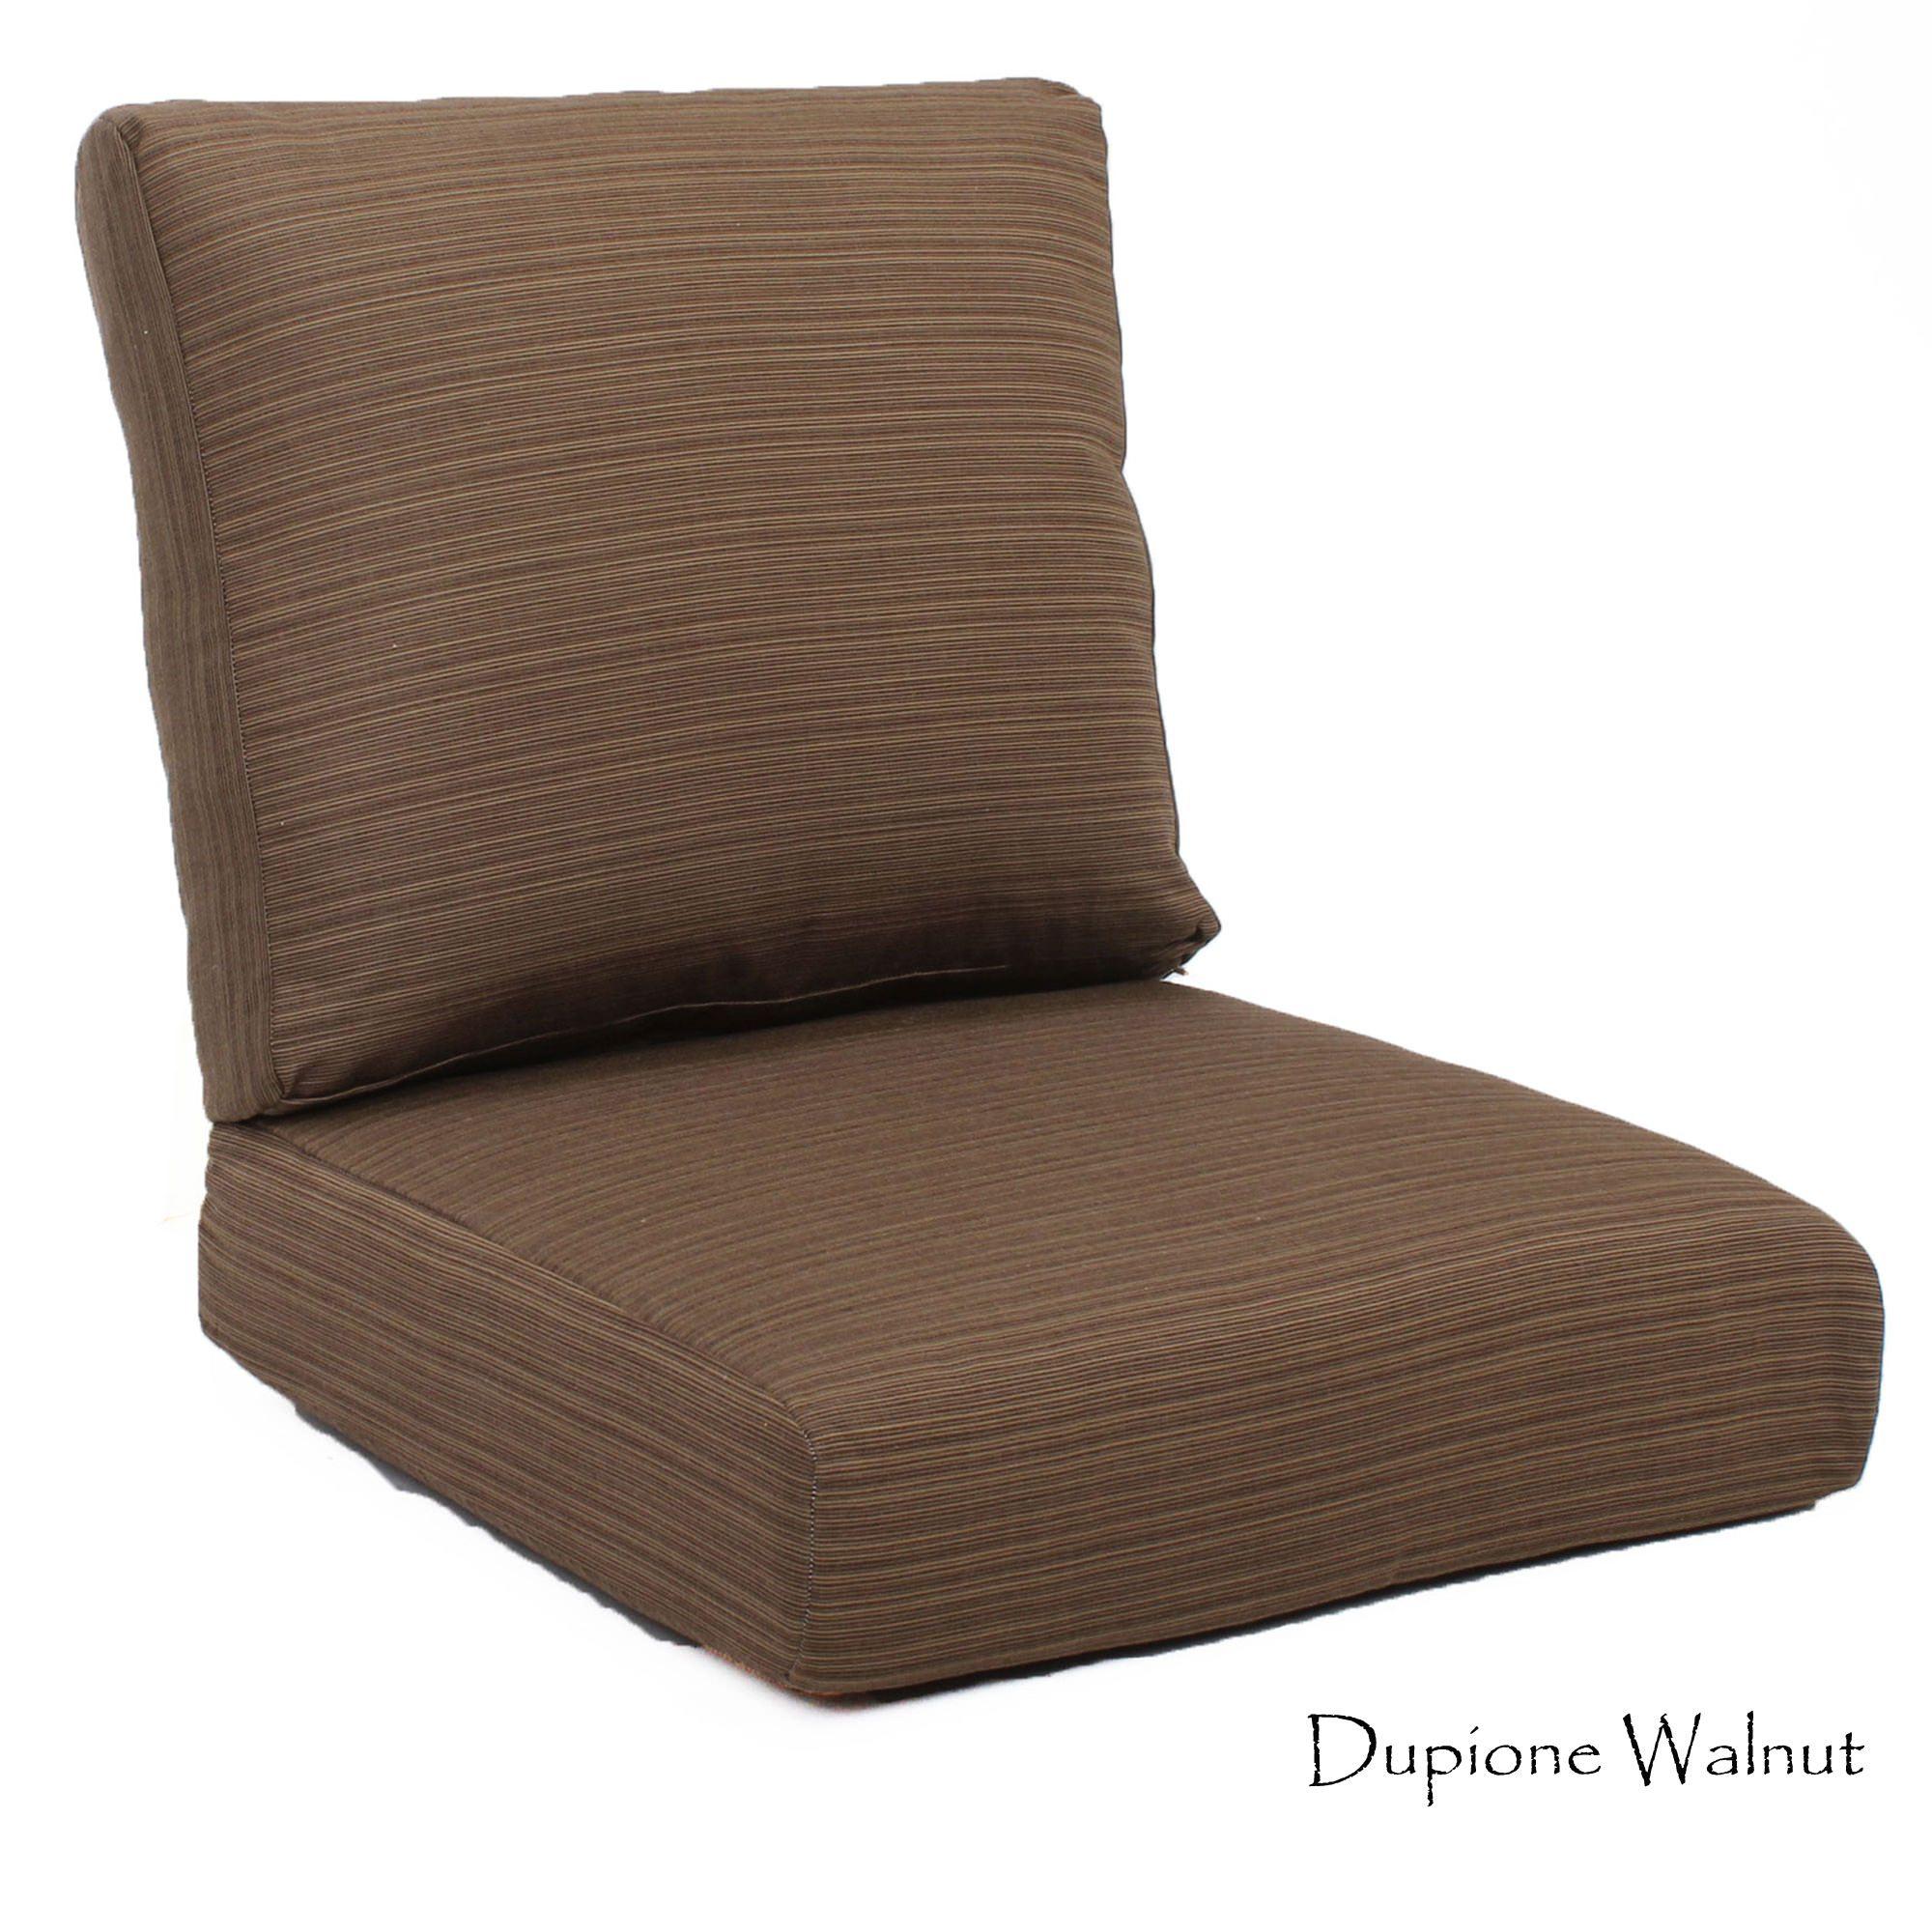 Breezesta SeatBack Cushions  Breezesta  SKU BRZ